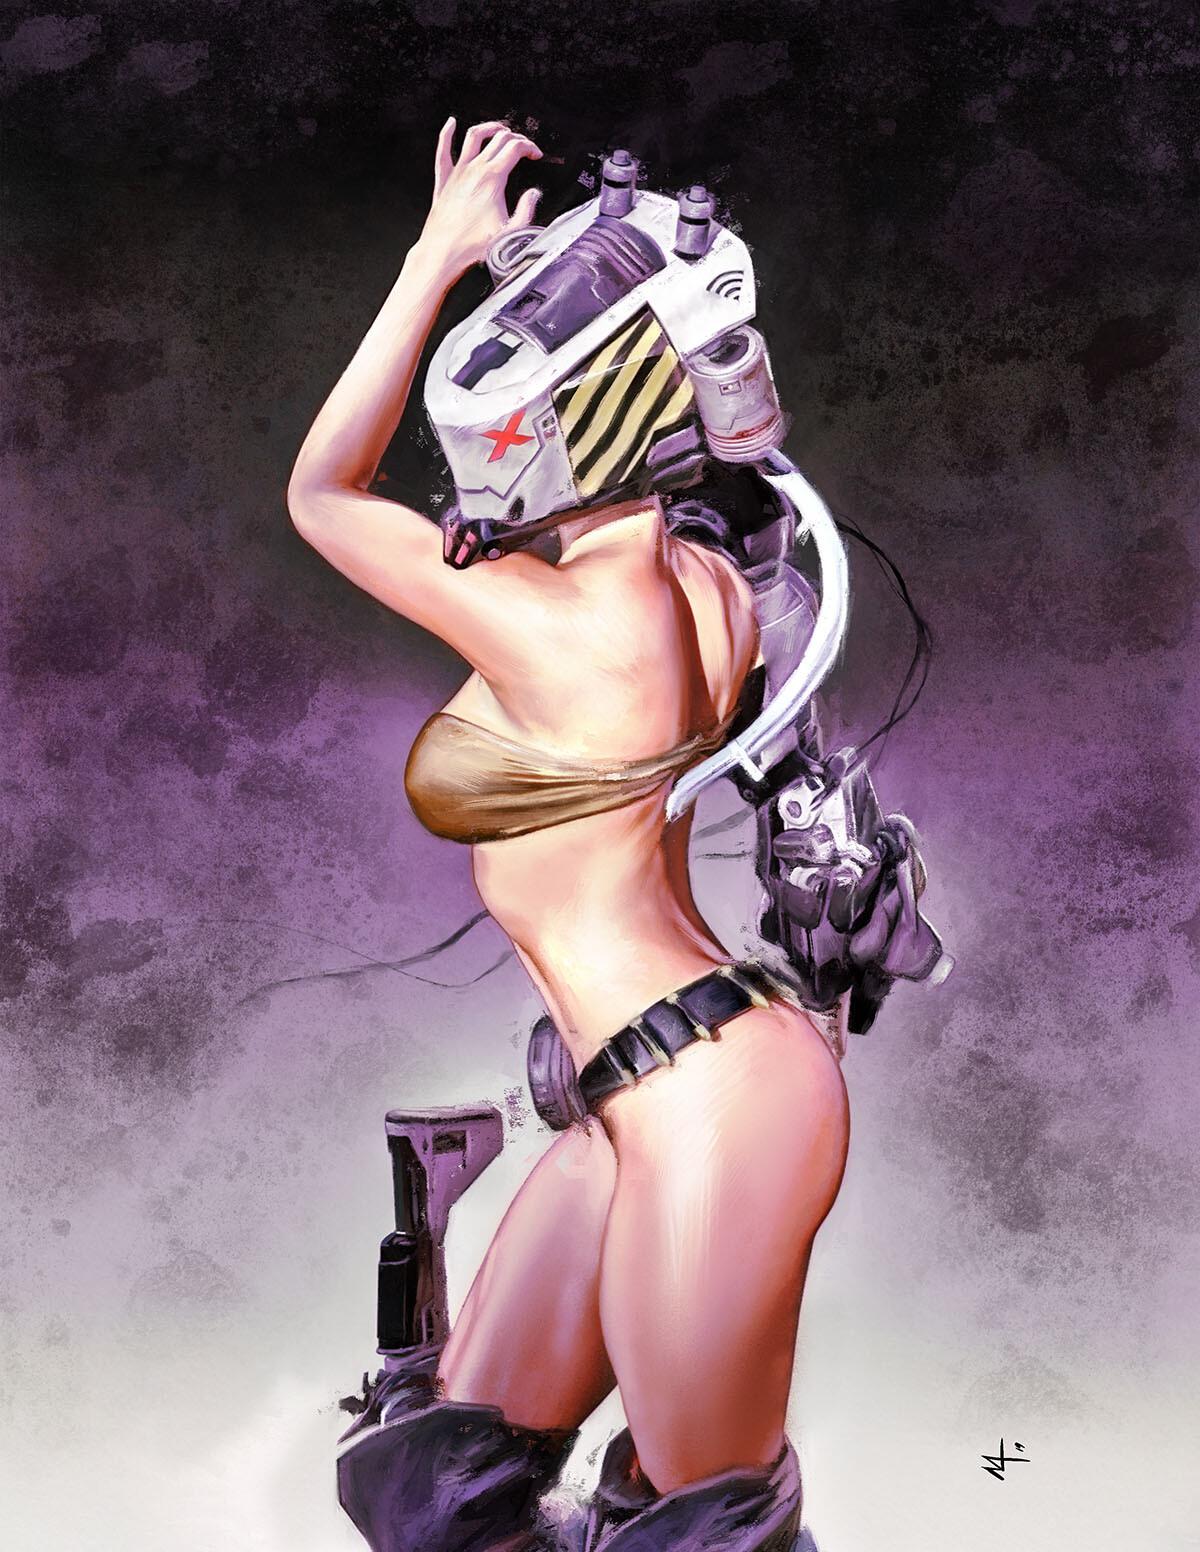 Sci fi skirt dick